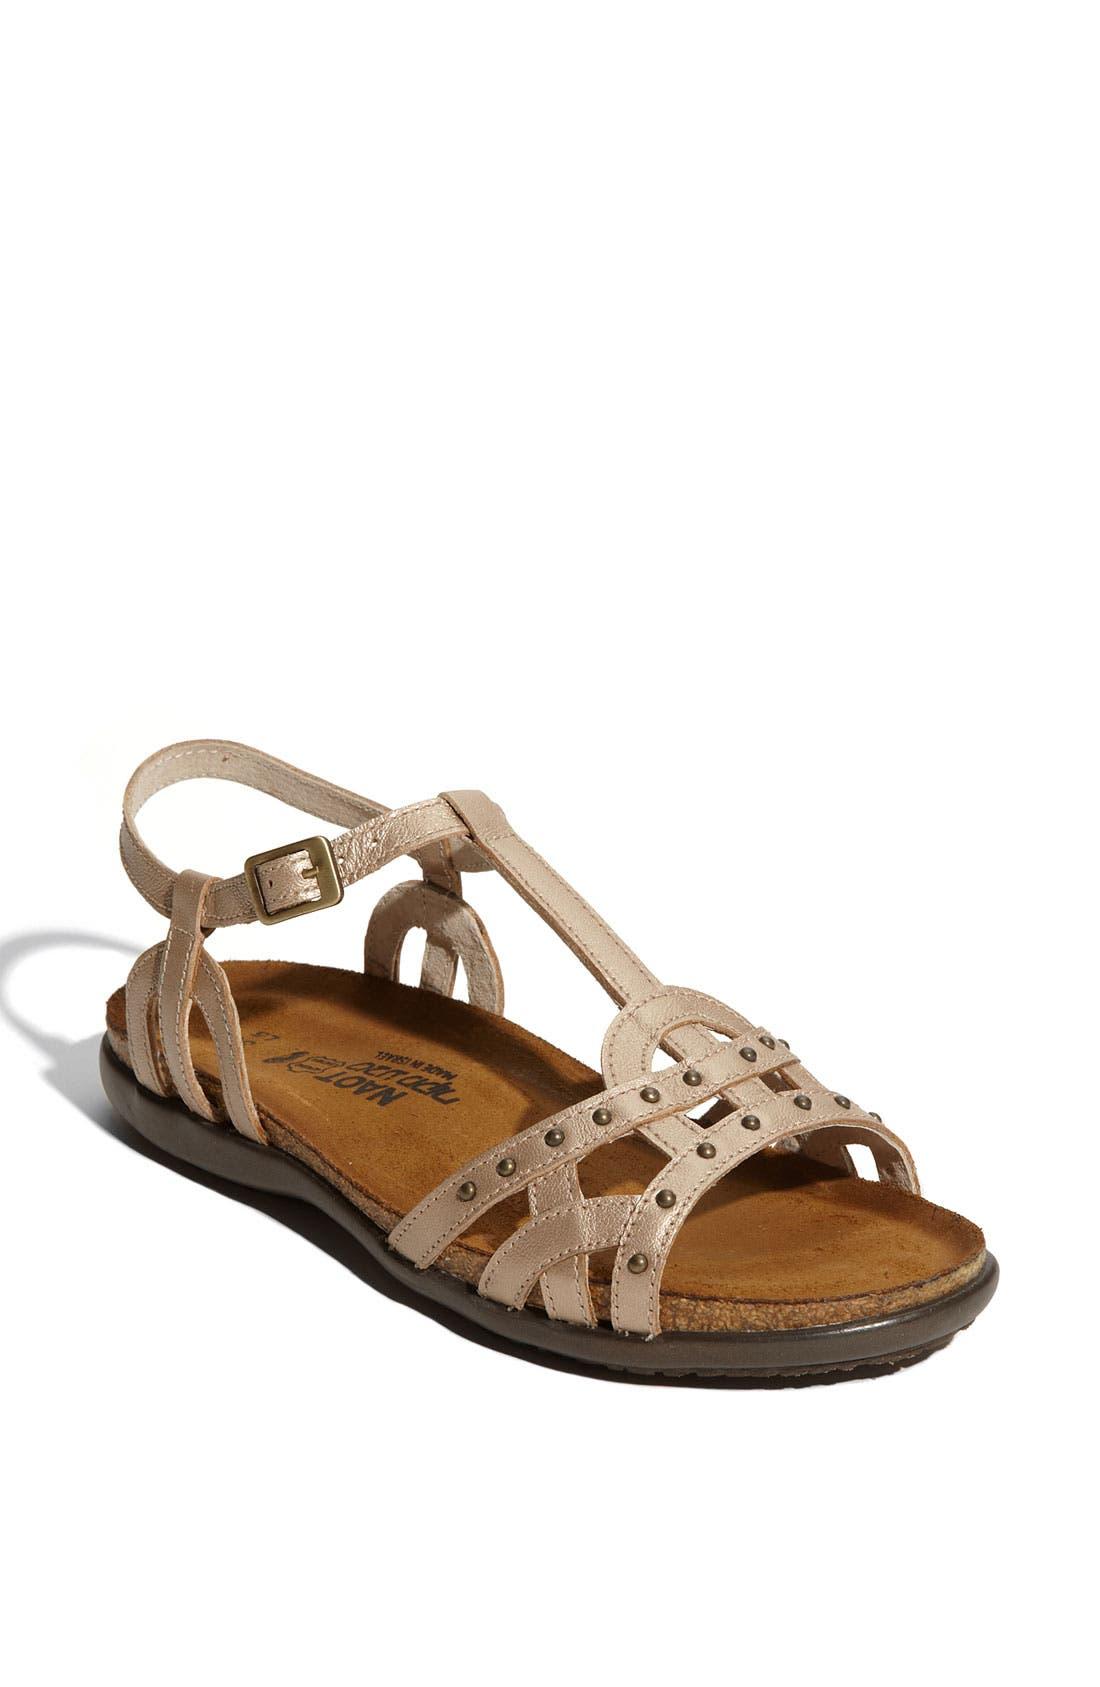 Alternate Image 1 Selected - Naot 'Elinor' Sandal